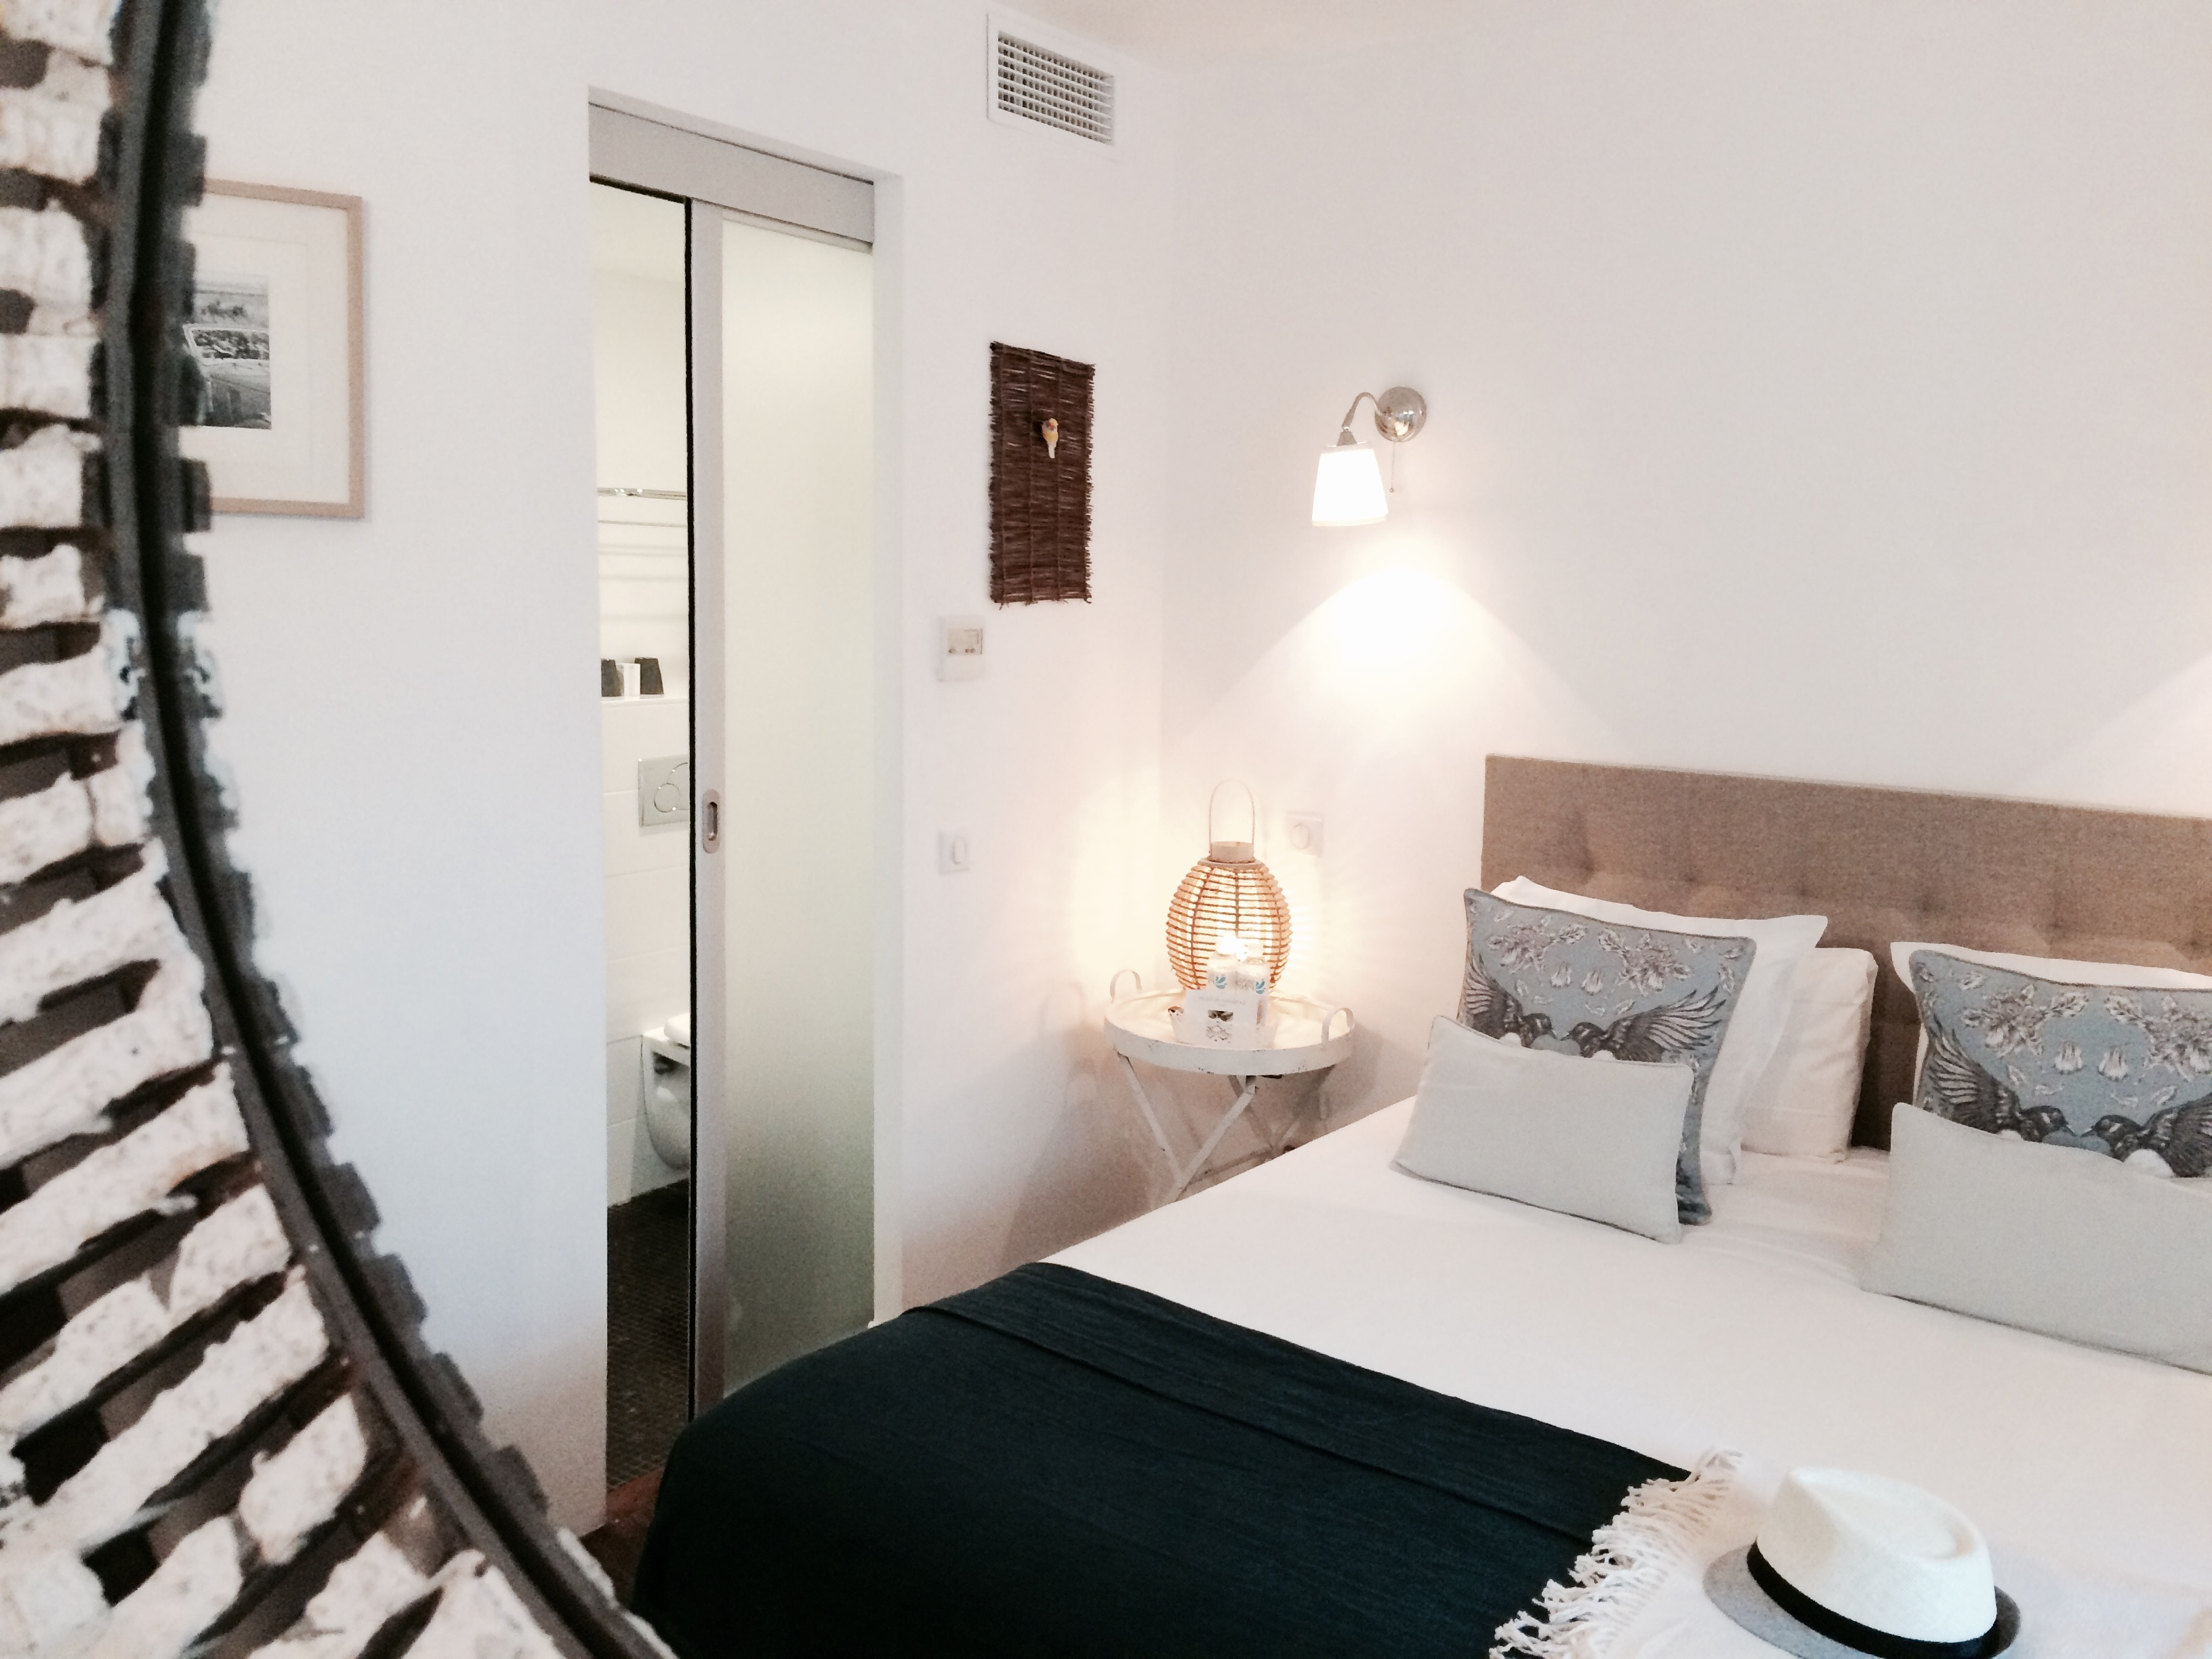 Hotel Lierre Bordeaux